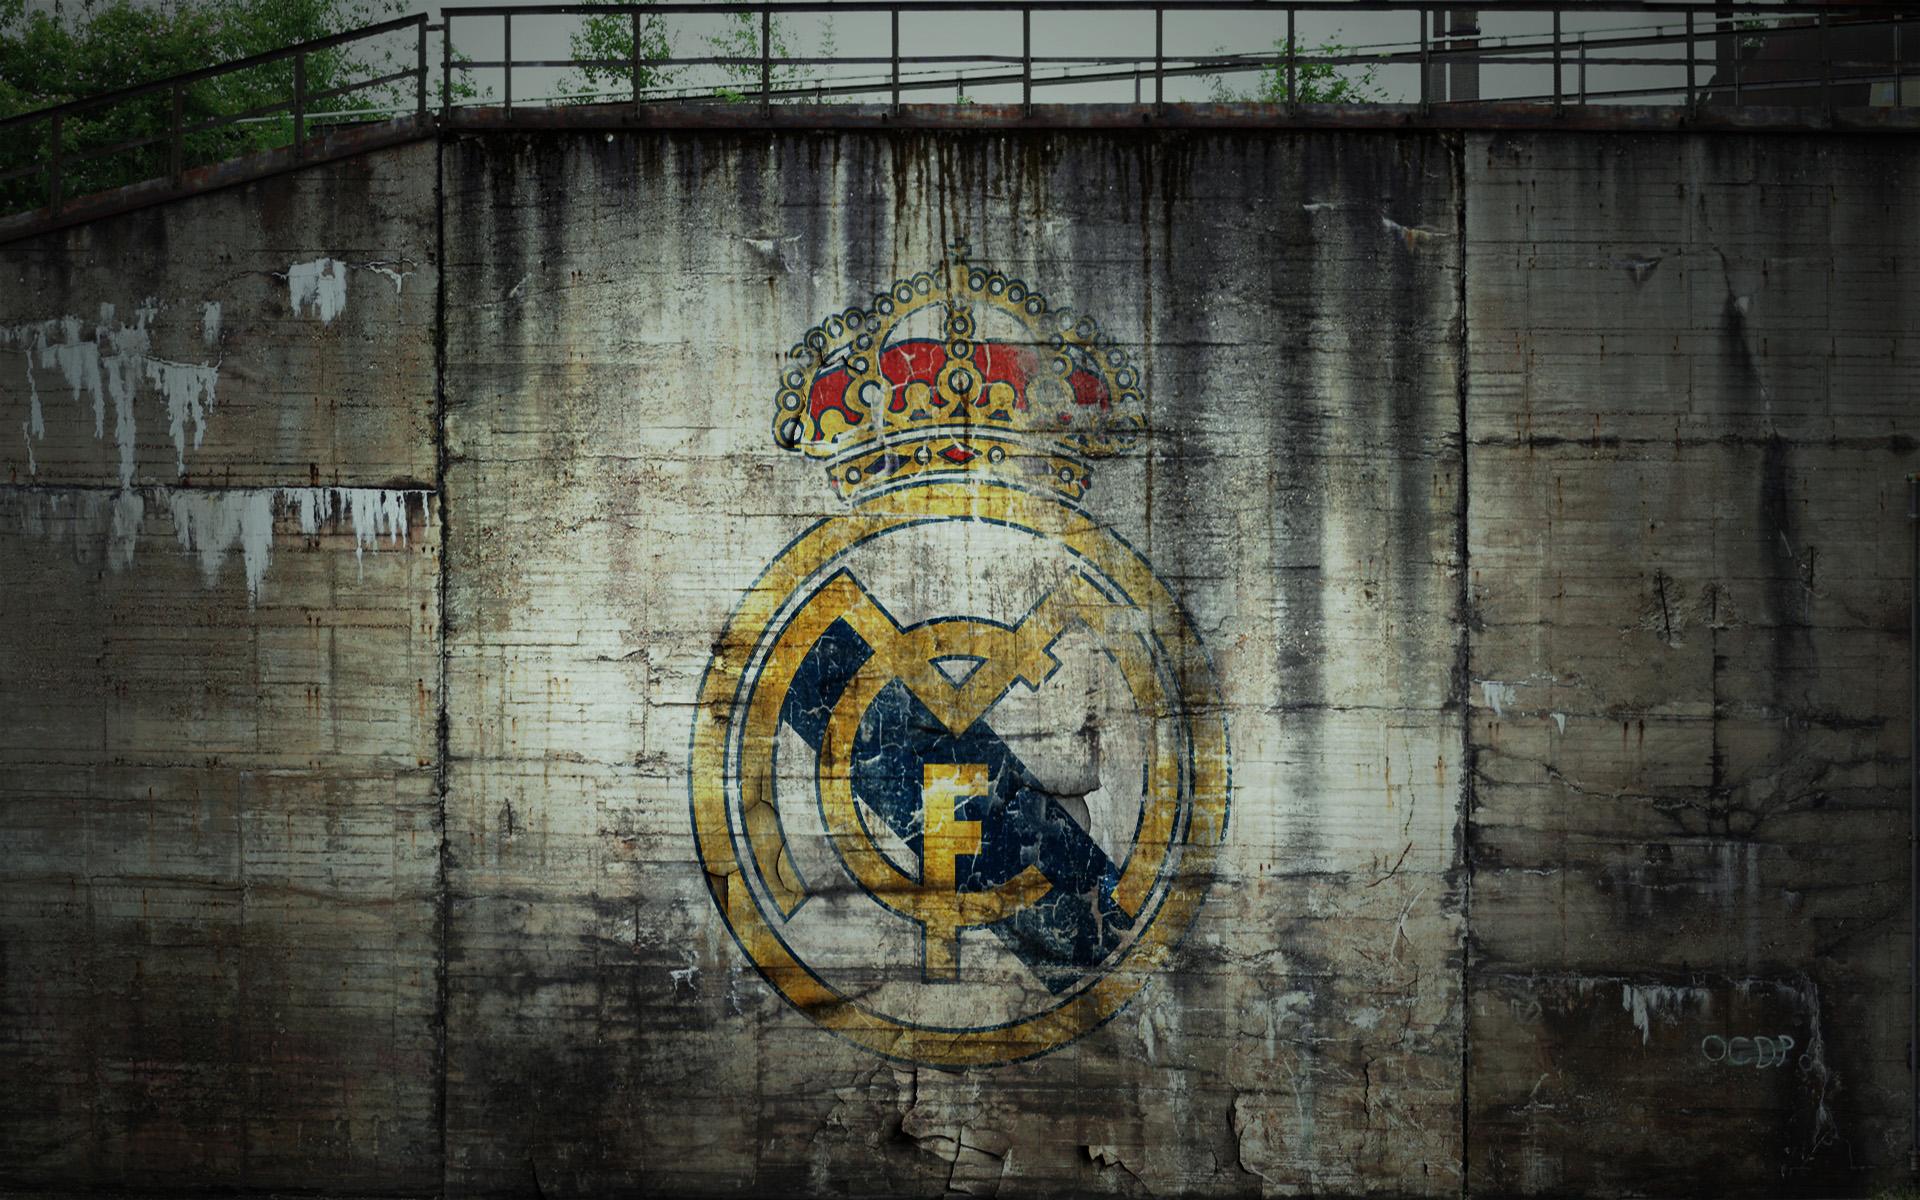 wallpaper escudo real madrid en graffiti